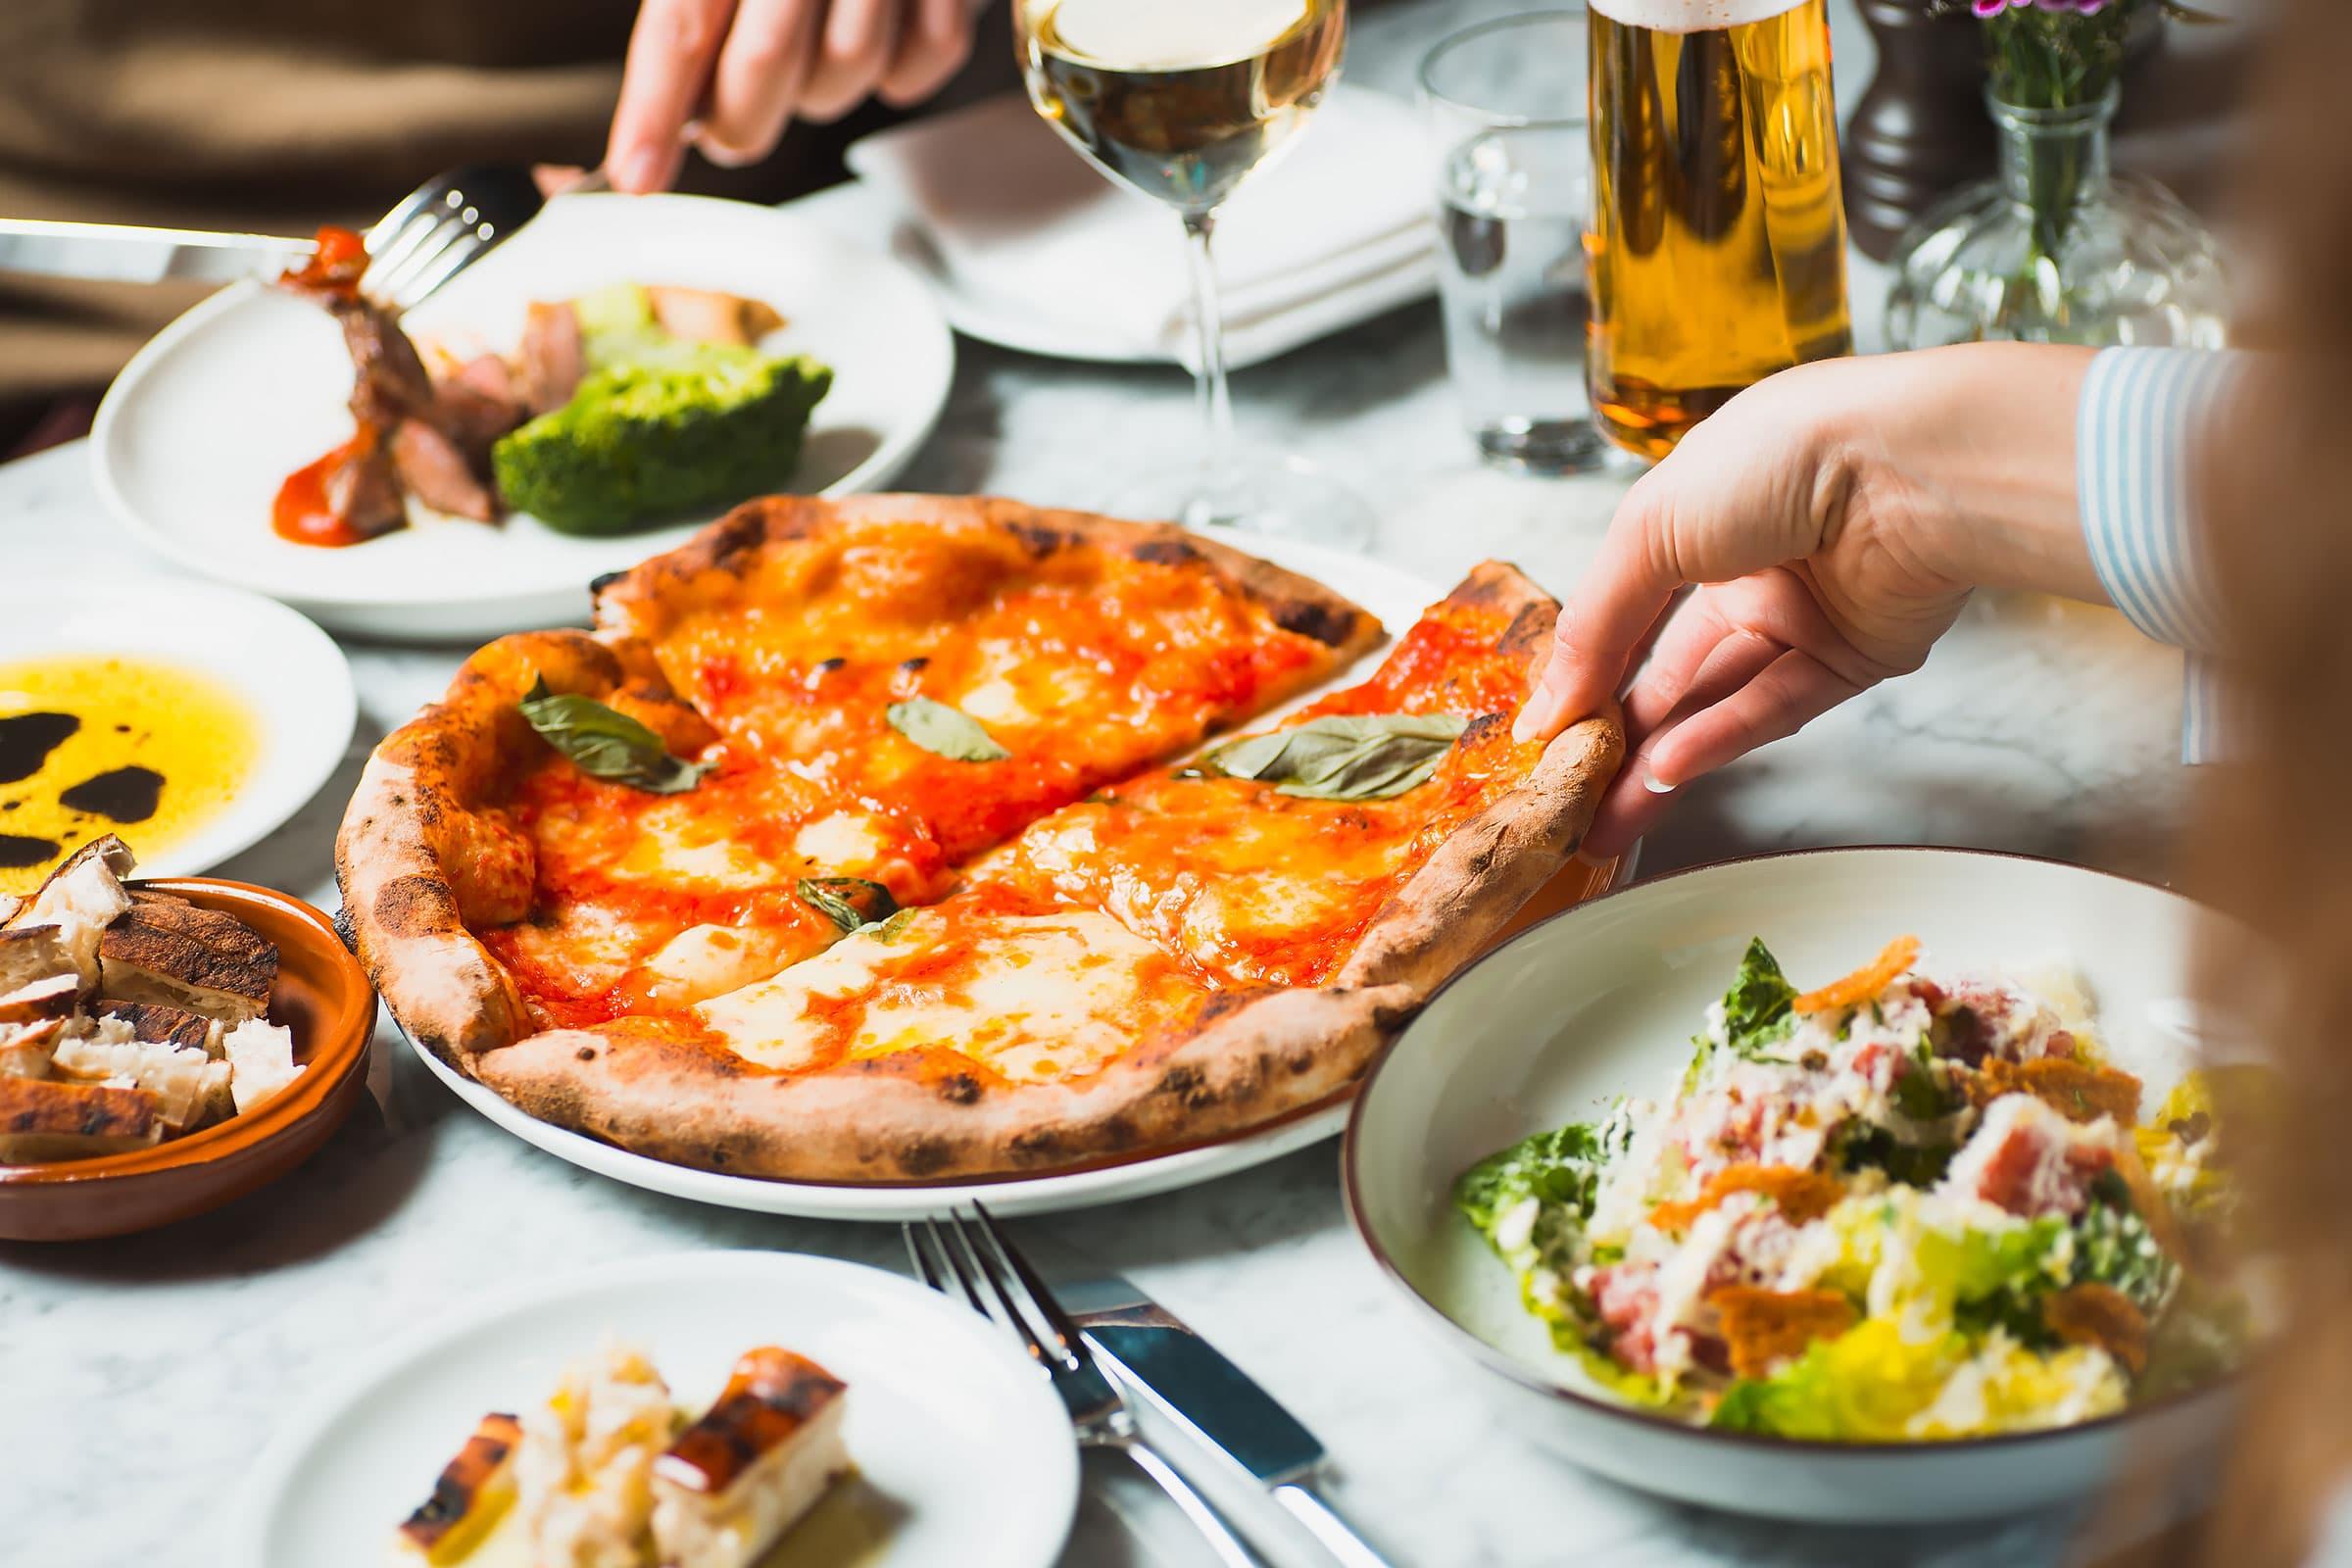 Best Italian Interior Design Projects In Dubai: The Best Italian Restaurants In Stockholm